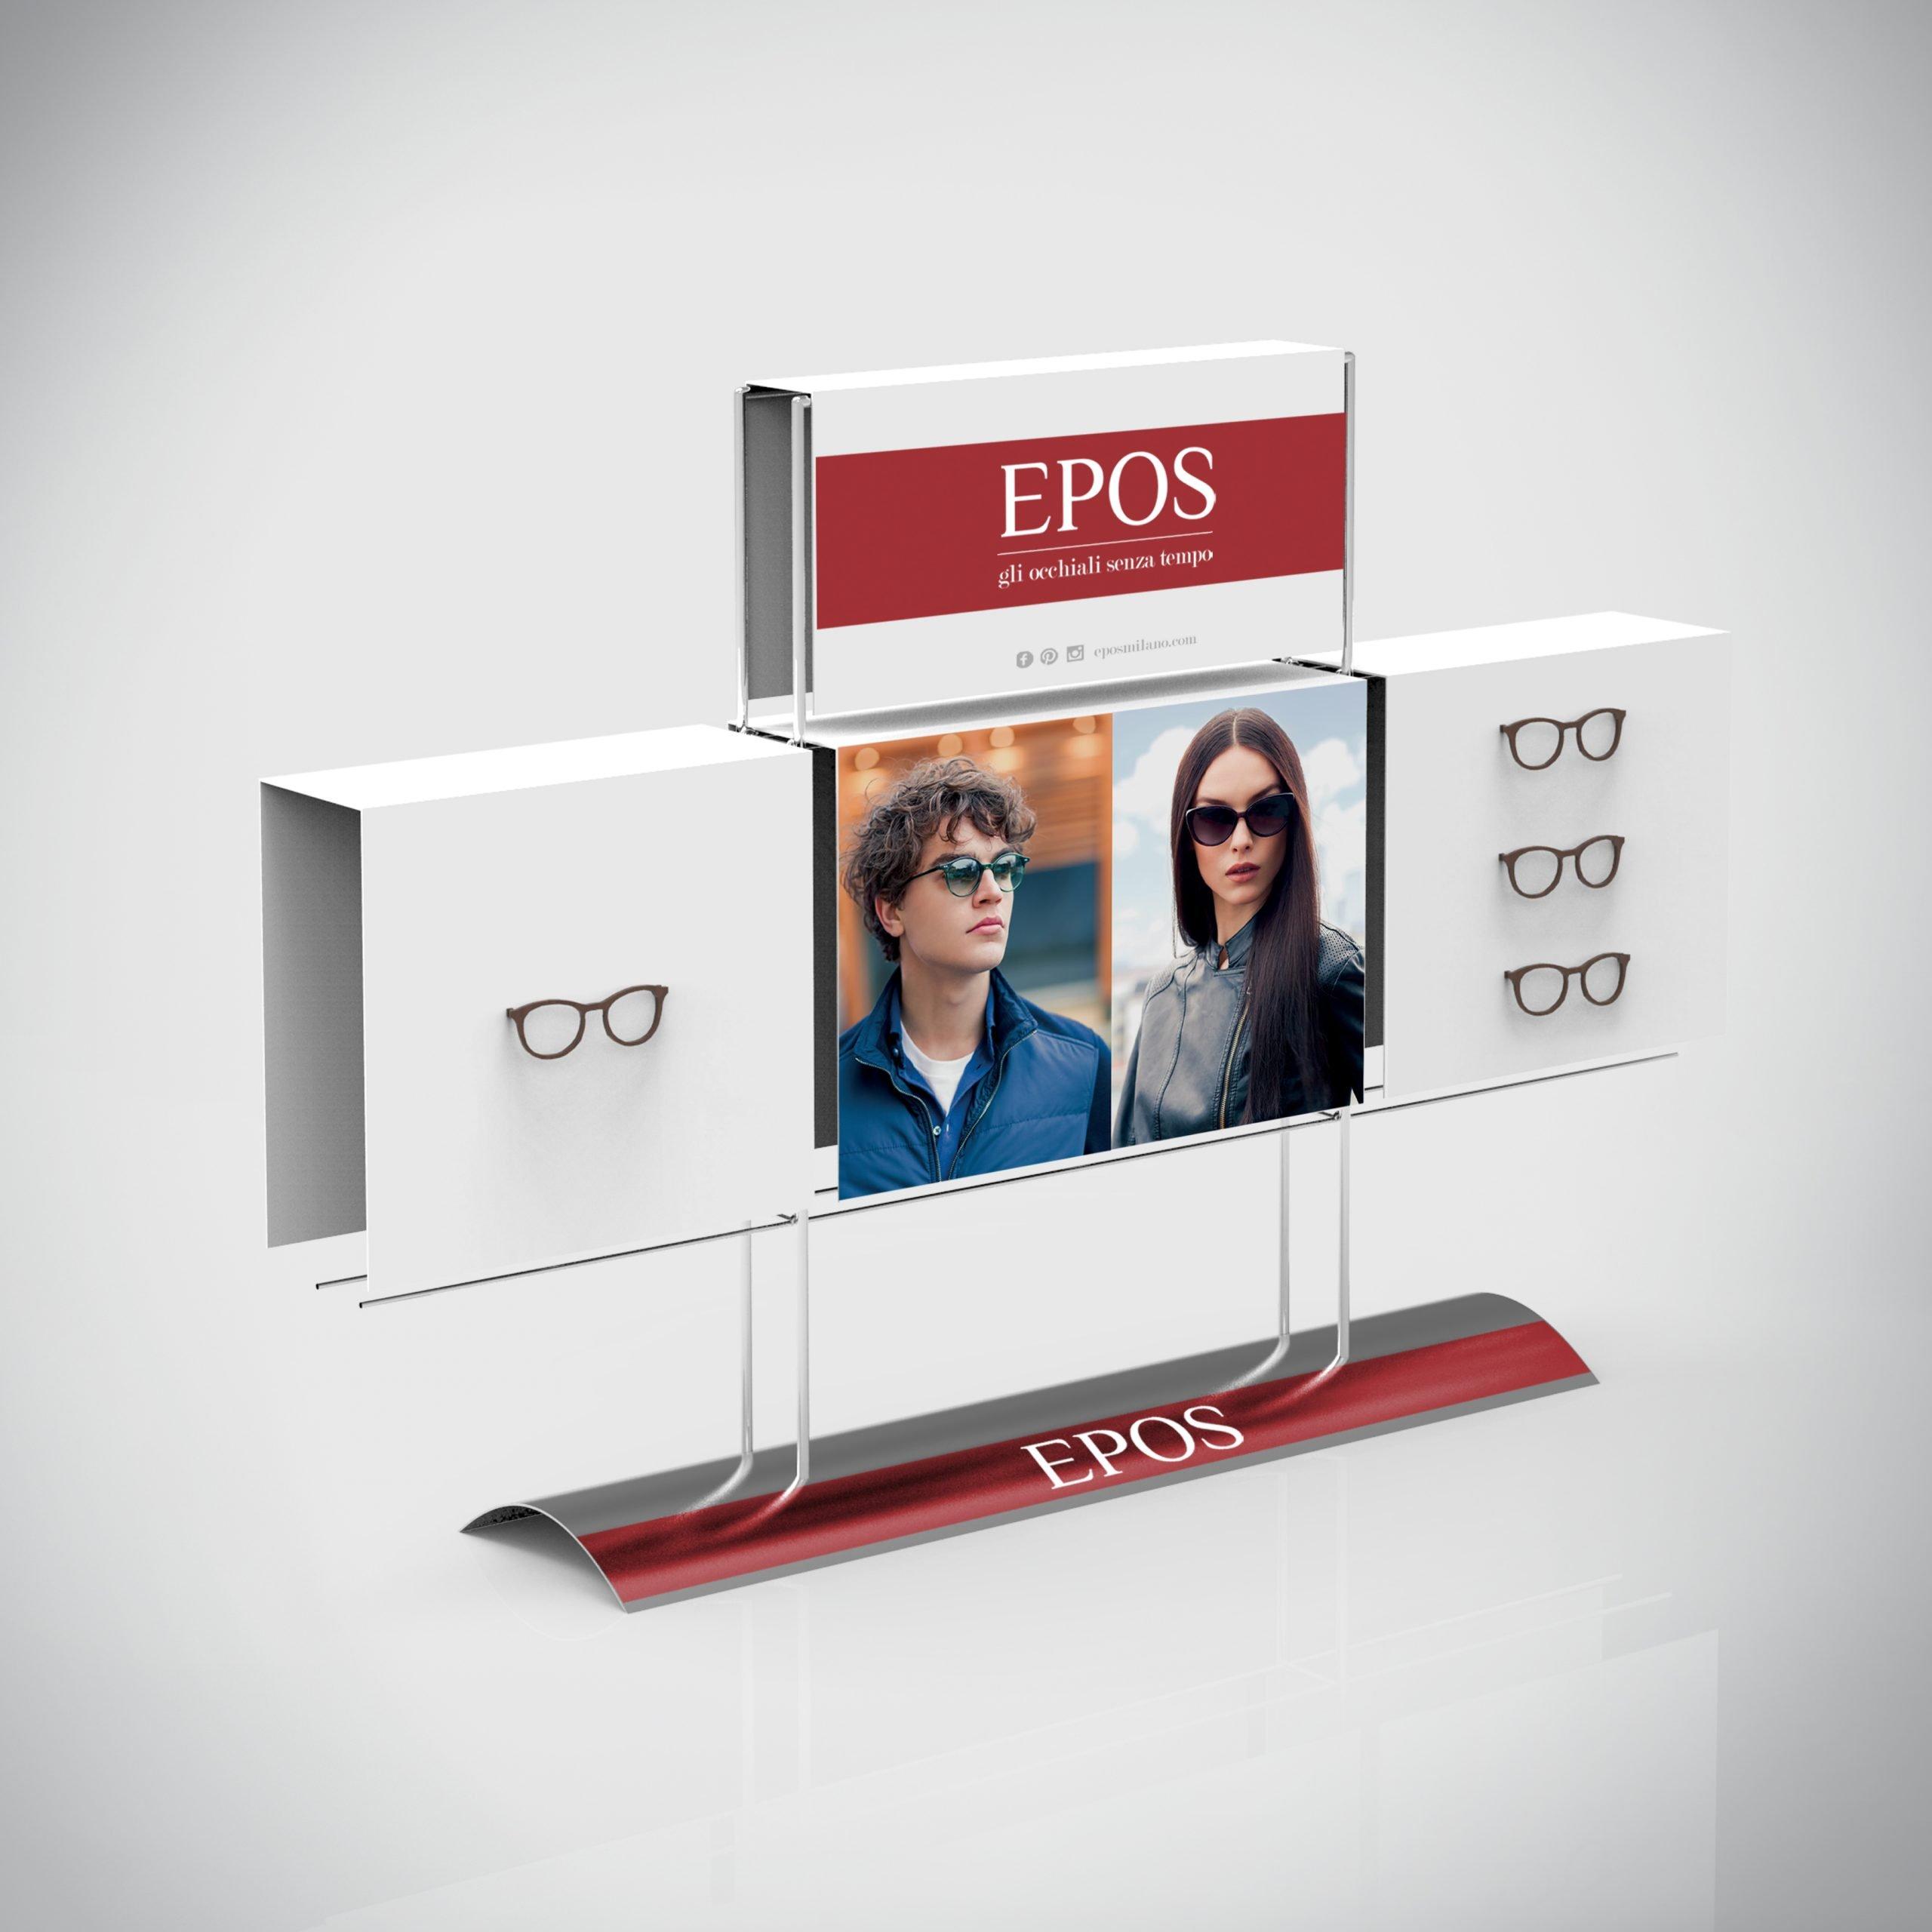 Epos_variante banco